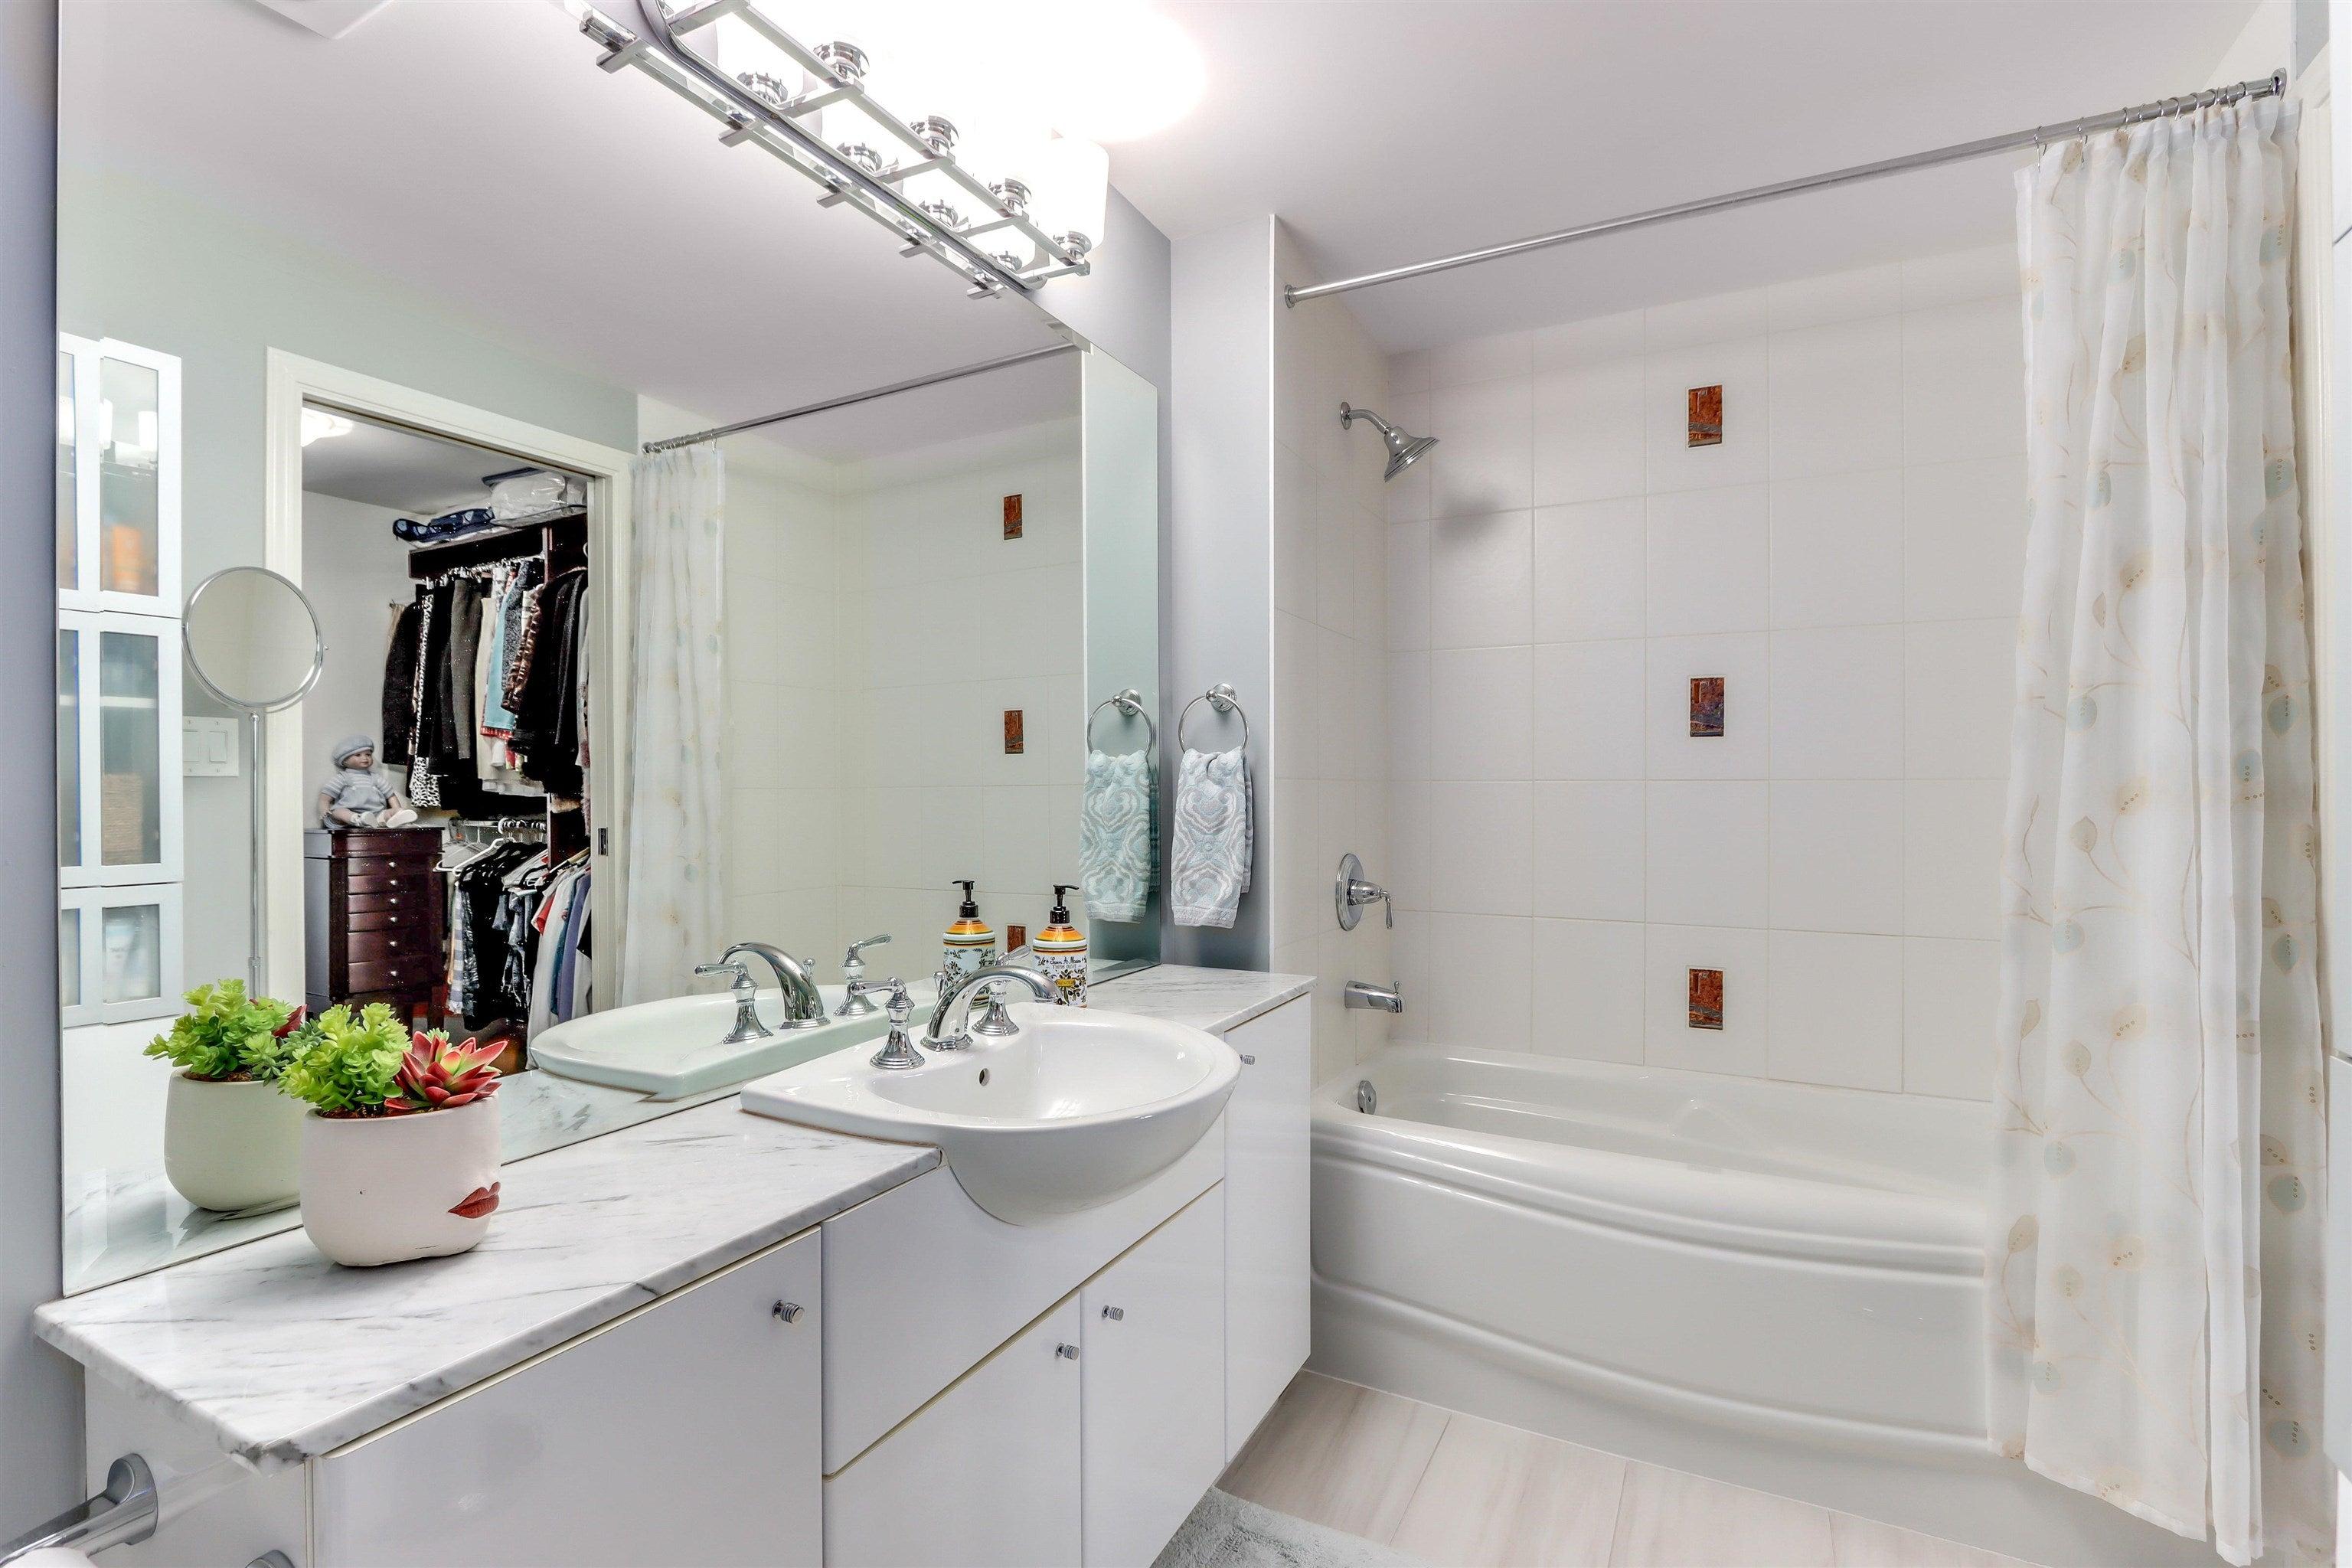 2202 188 E ESPLANADE - Lower Lonsdale Apartment/Condo for sale, 2 Bedrooms (R2618412) - #17